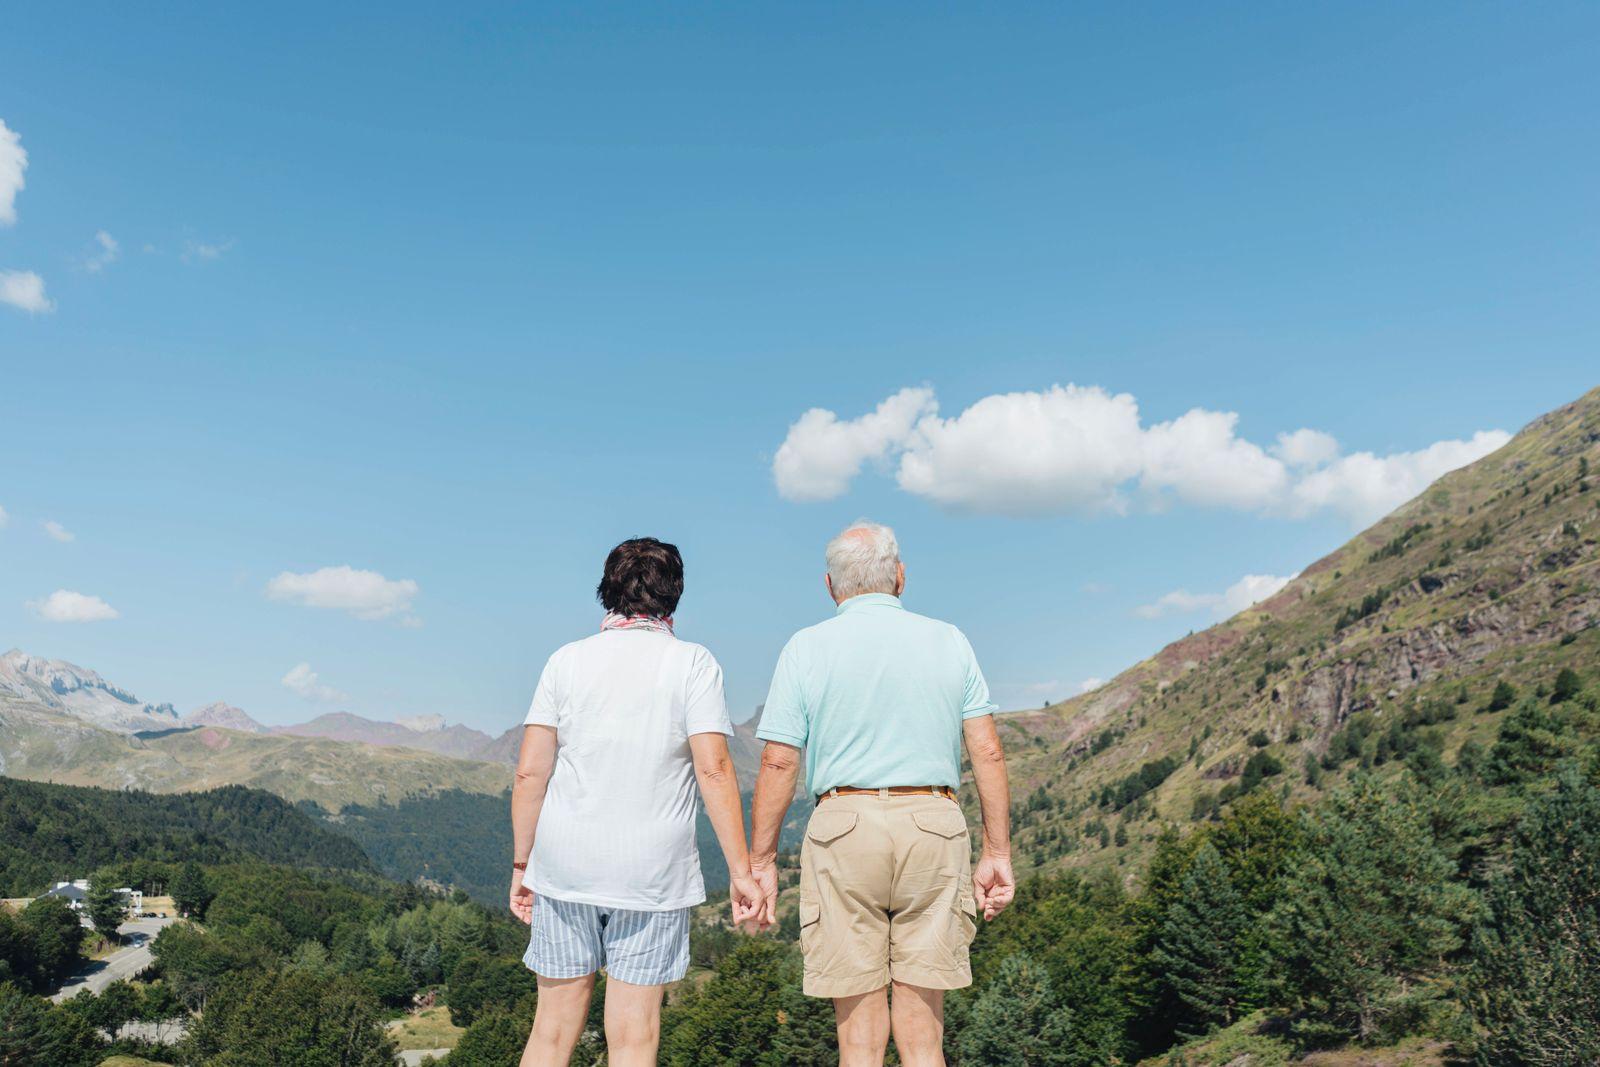 Back view of senior couple looking at view hand in hand, Jaca, Spain model released Symbolfoto PUBLICATIONxINxGERxSUIxAU